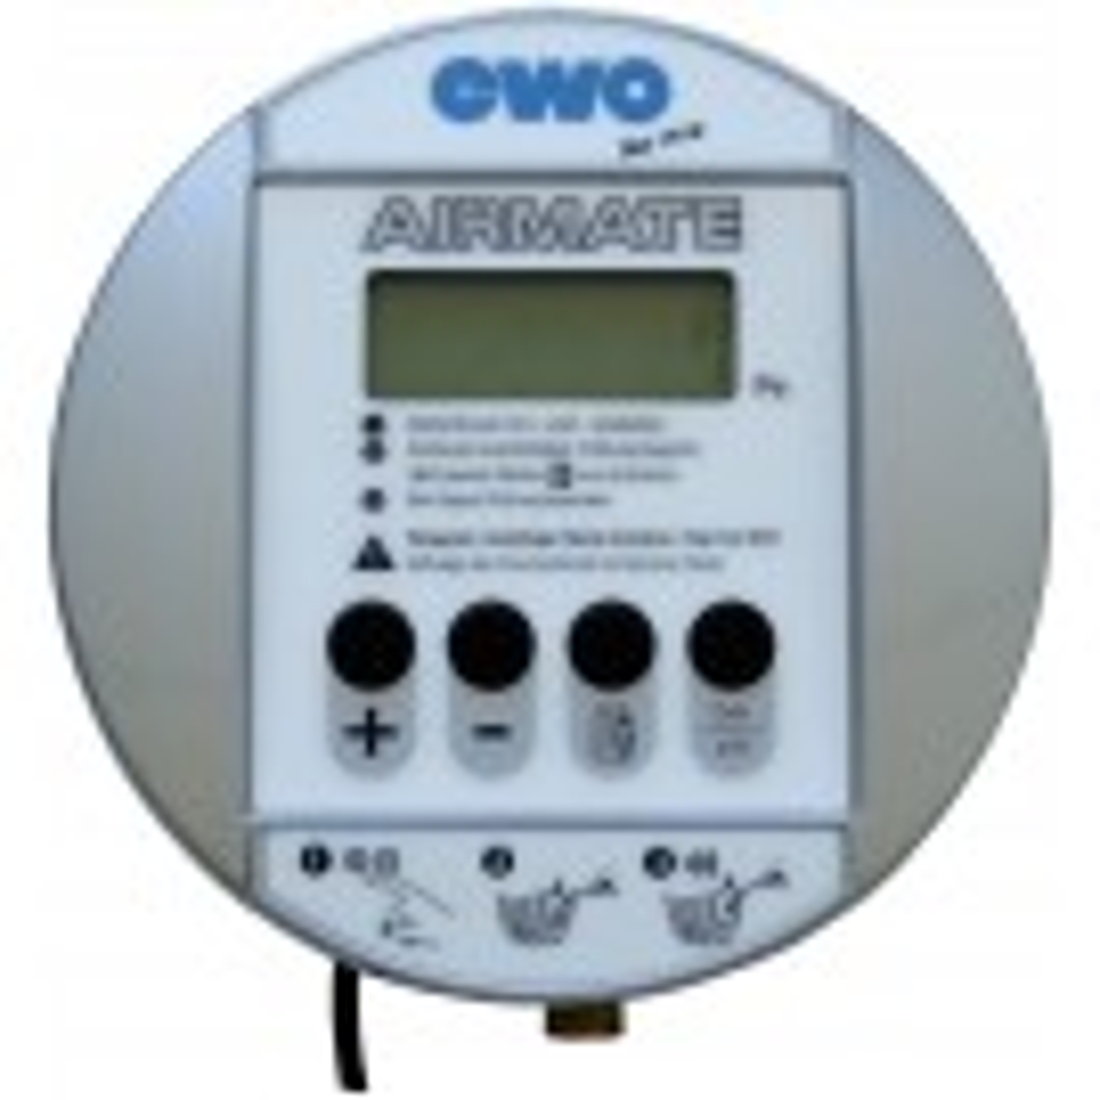 Digital tyre inflator 'airmate'